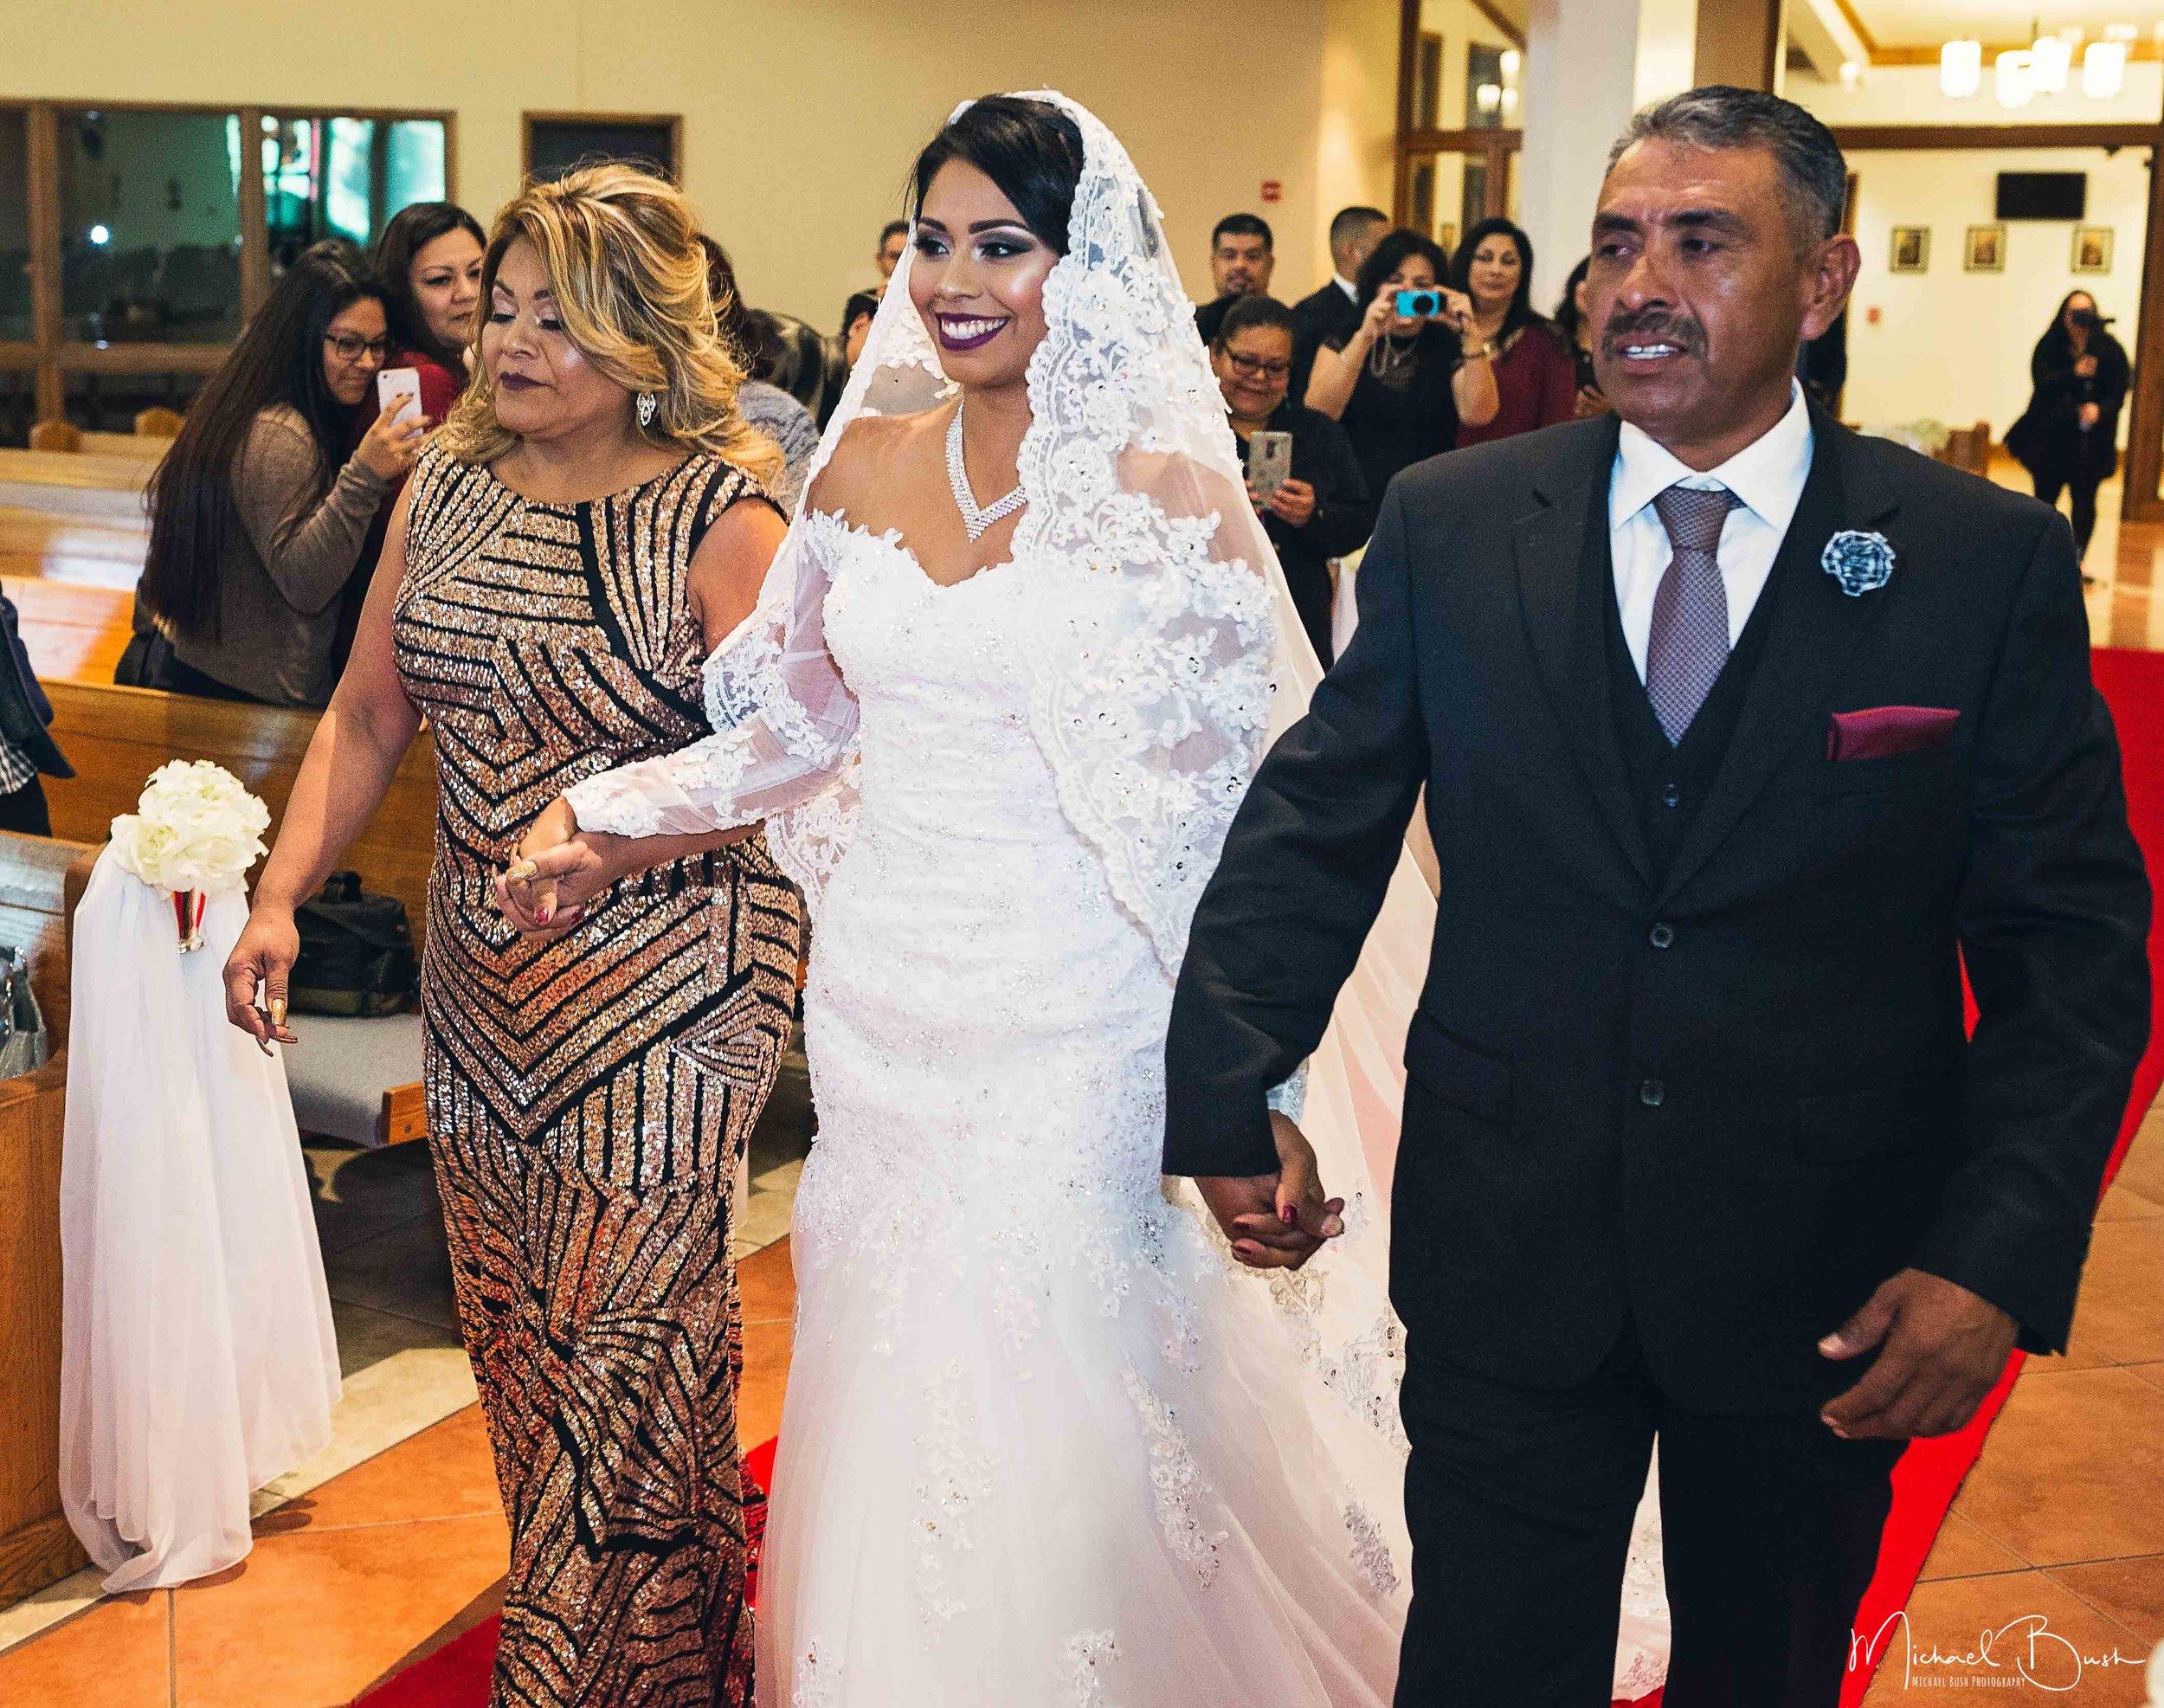 Wedding-Details-Bride-Fort Worth-colors-Ceremony--bride-groom-parents-isle.jpg